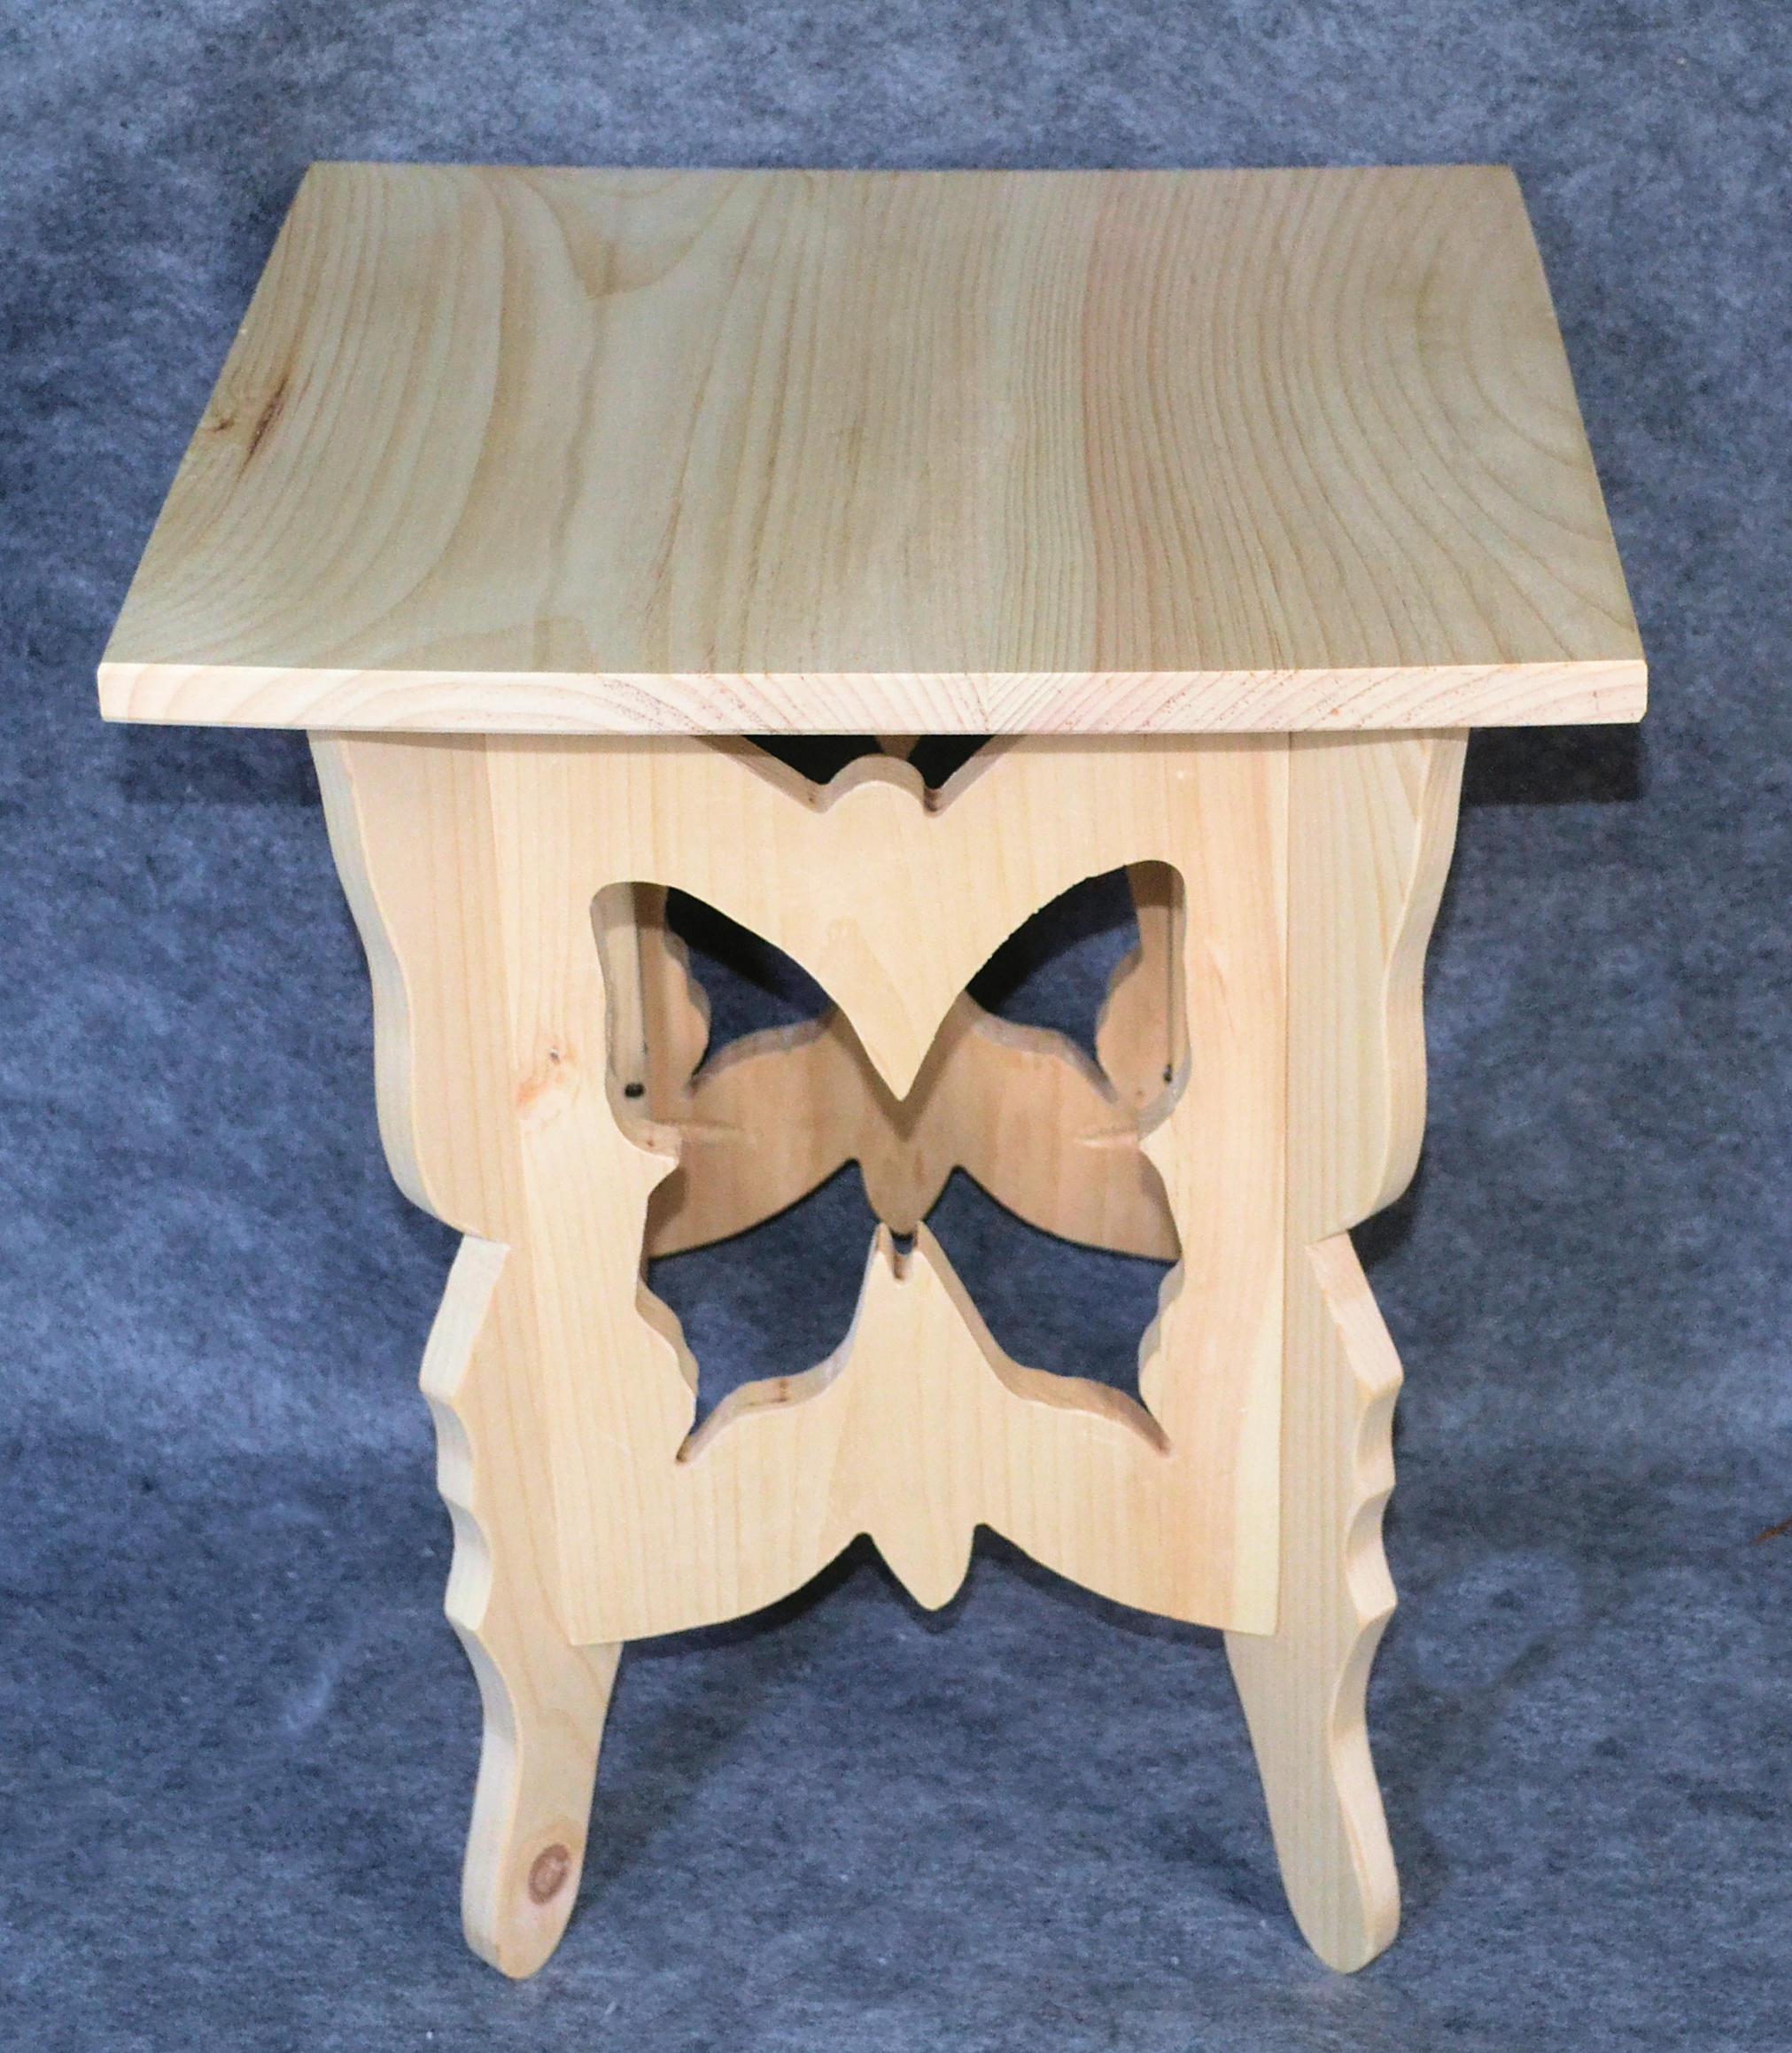 wood-buterfly-table-2020022-1.jpg